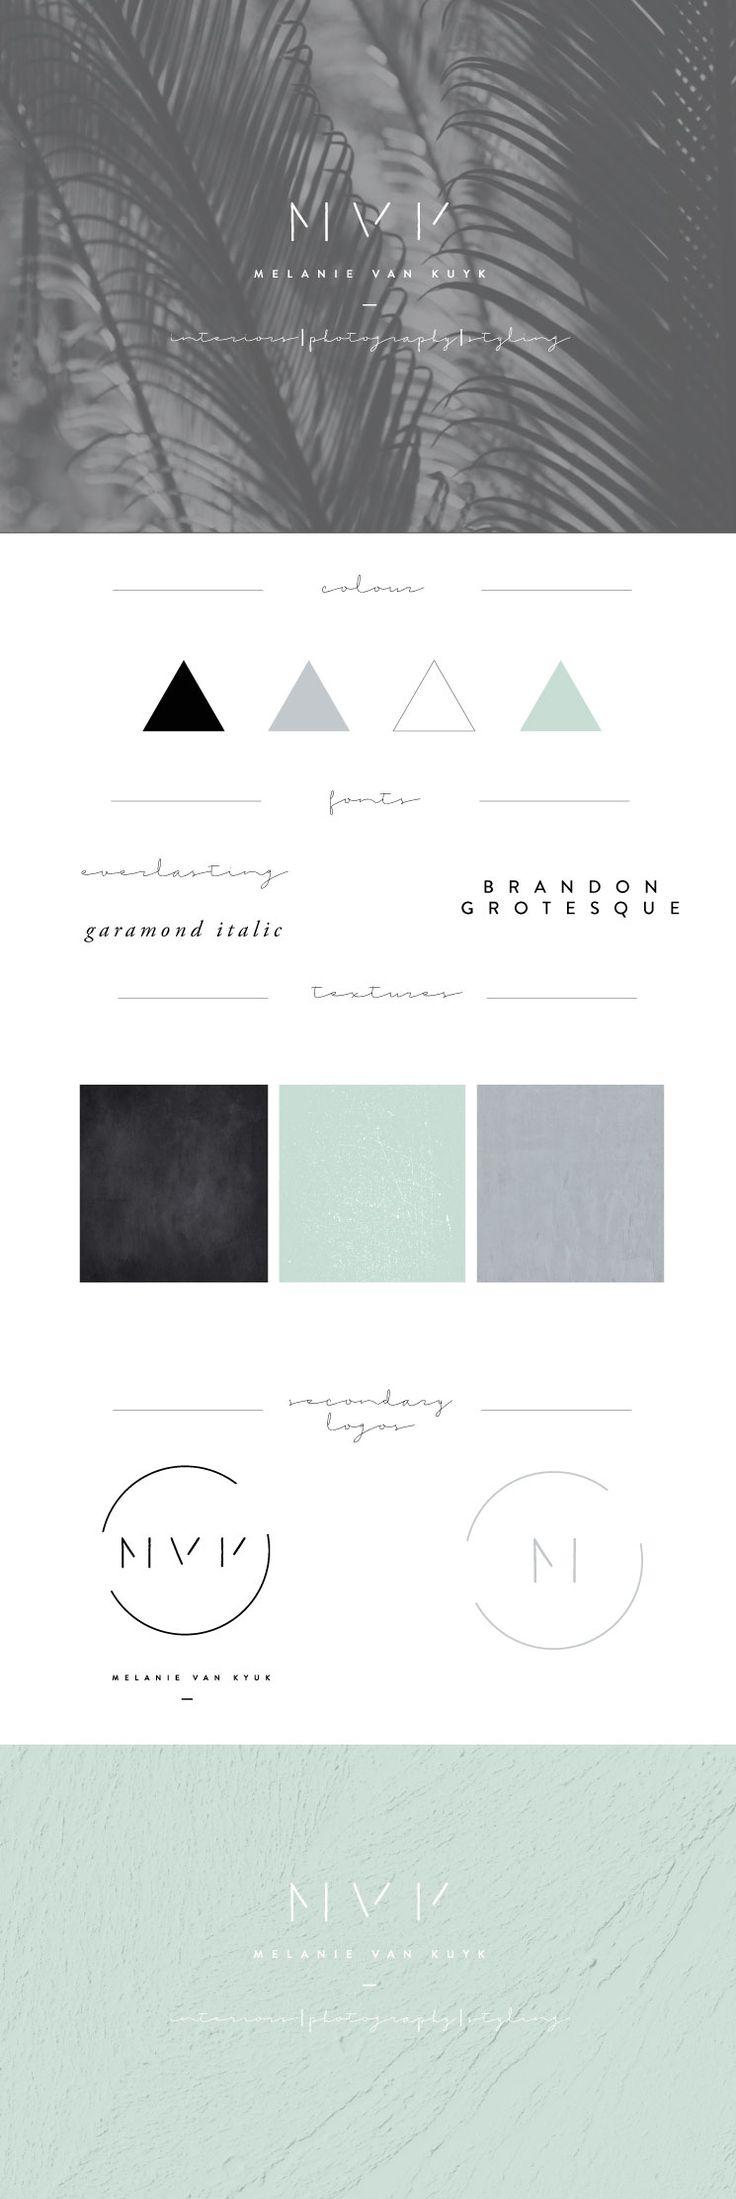 Scout Digital | Branding Case Study for MVK. Minimal Branding | Minimal Design | Minimal Logo Design